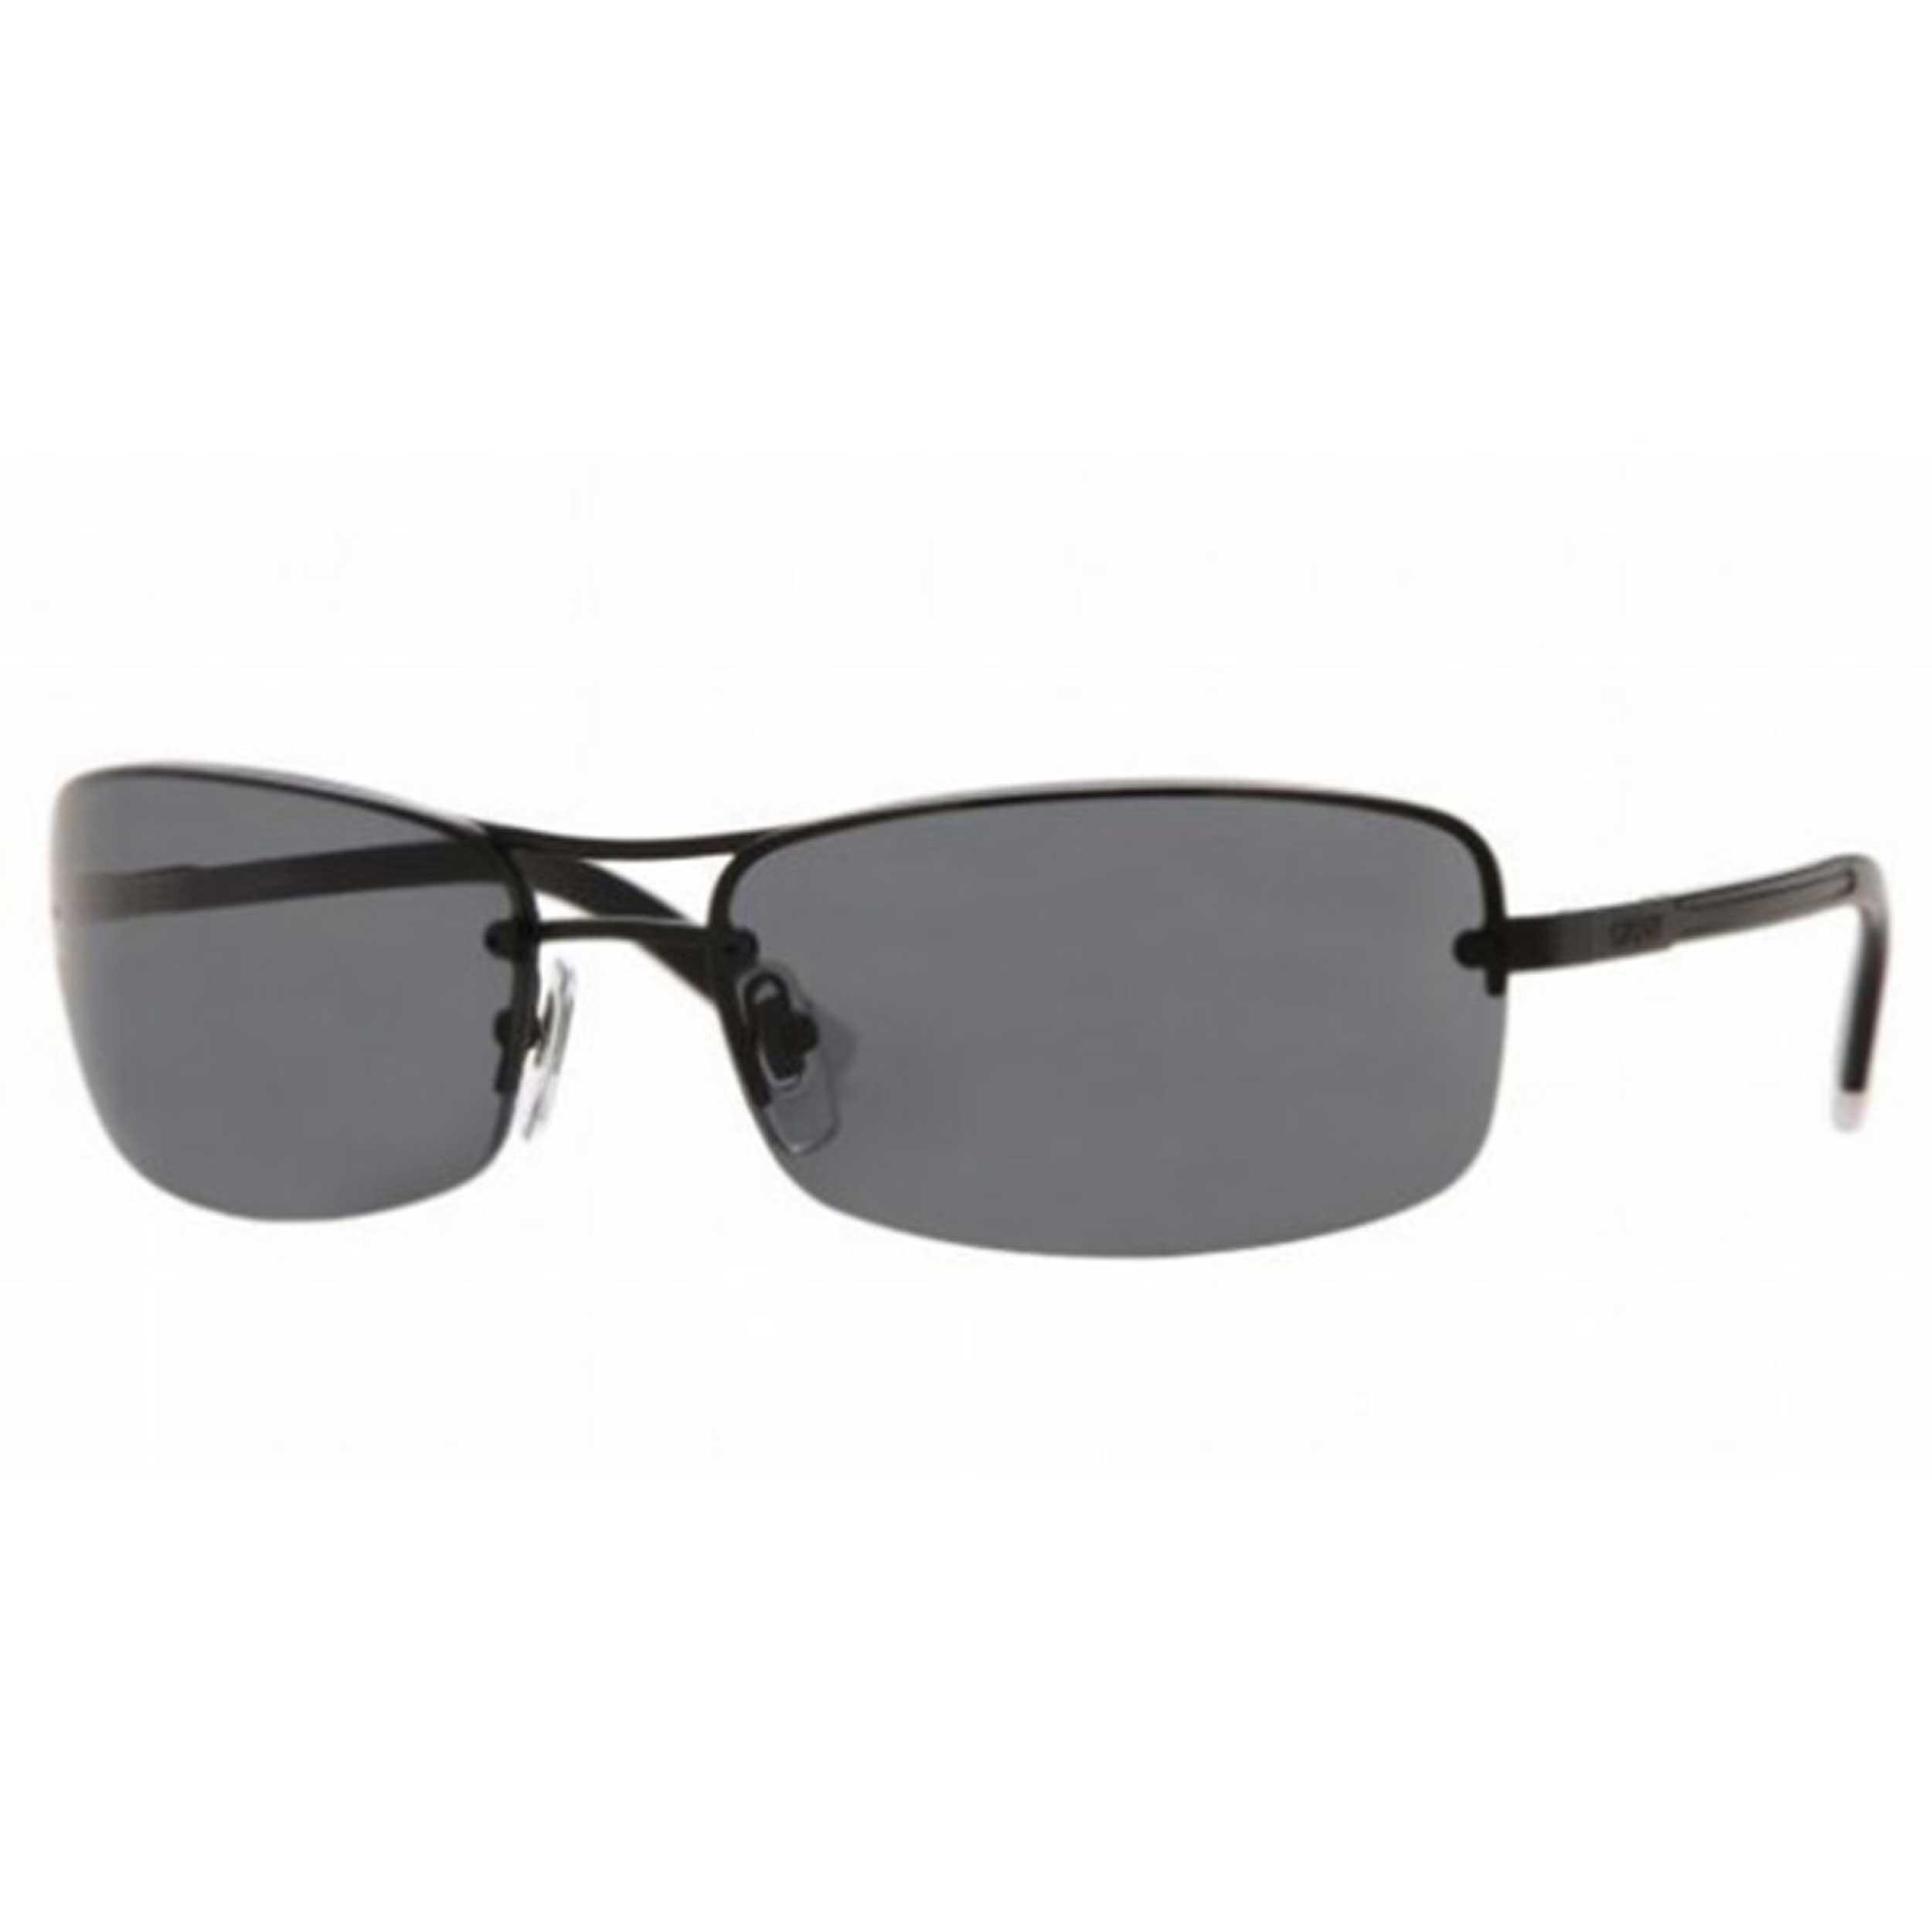 عینک آفتابی دی کی ان وای مدل DY5038S 100487 6315